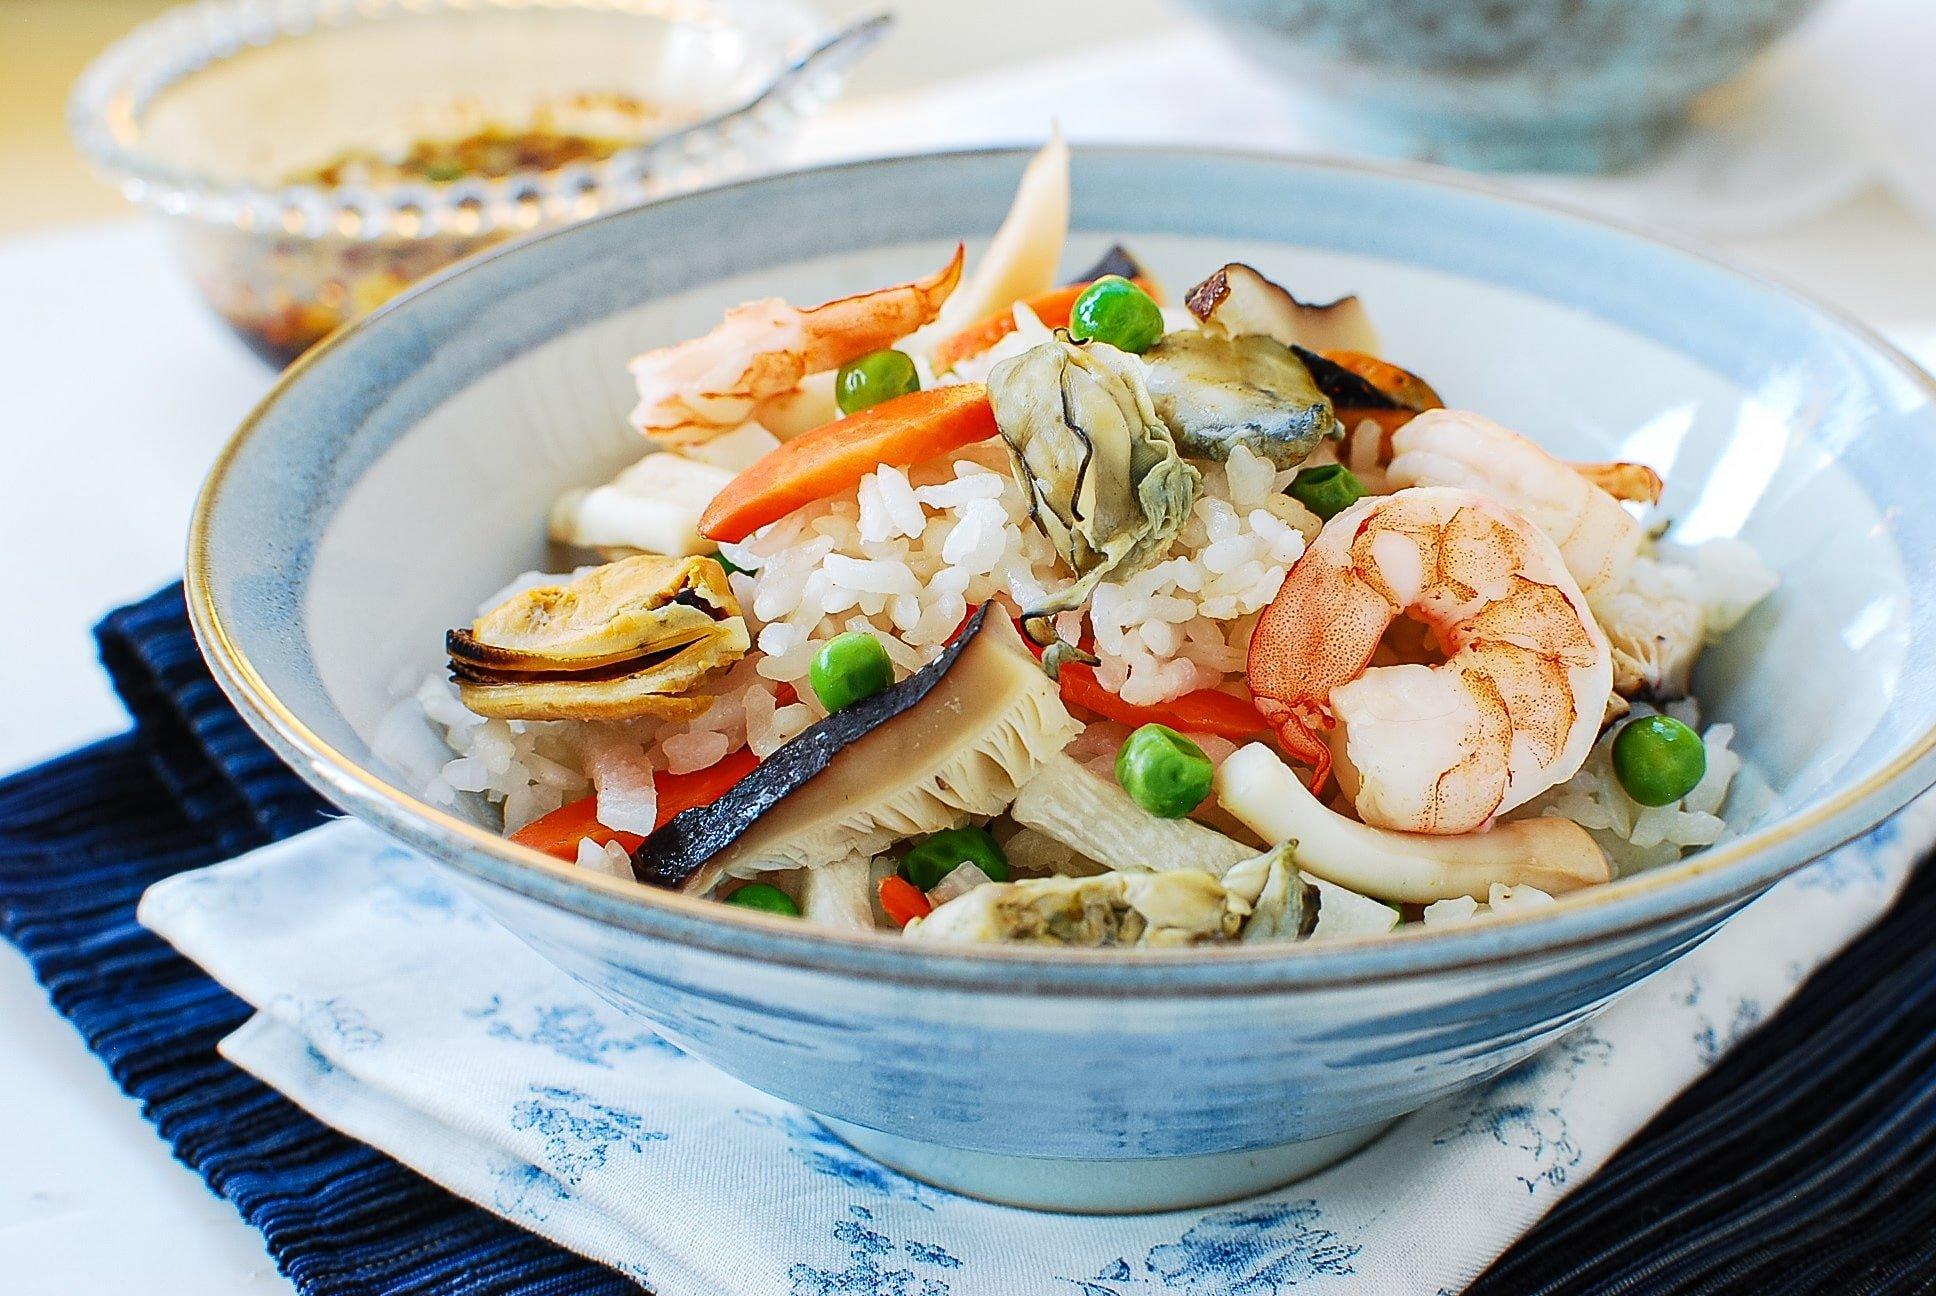 DSC 4150 2 - Haemul Bap (Seafood Rice Bowl)